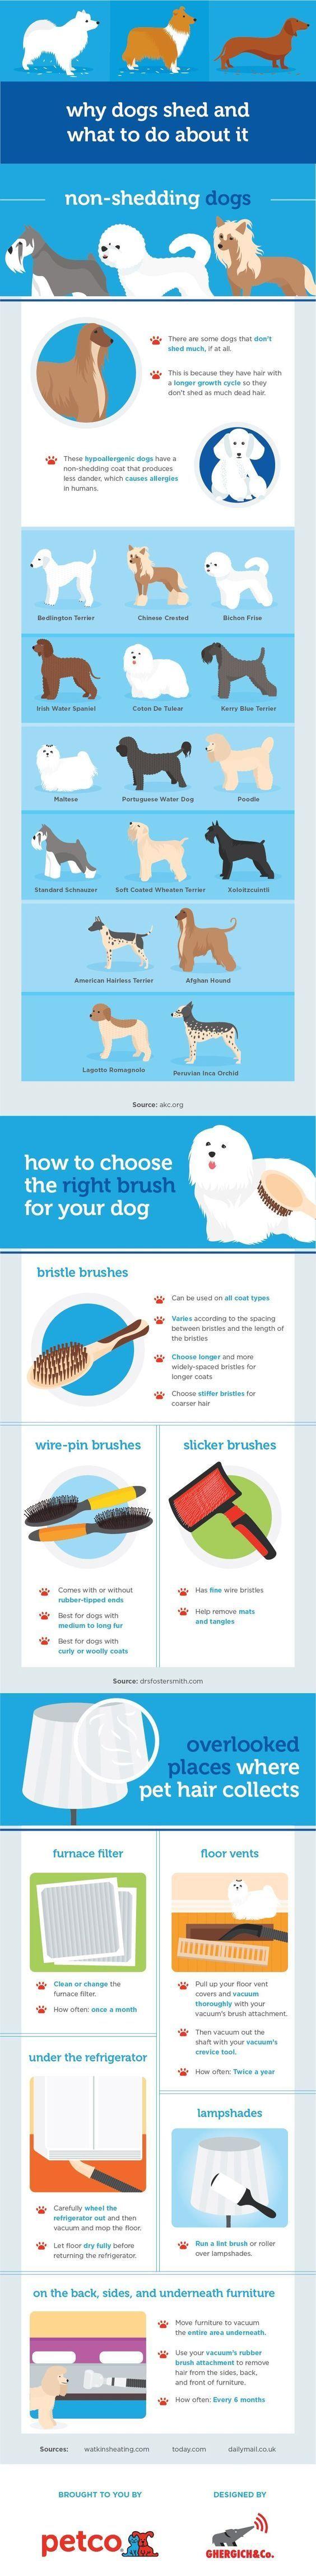 dogs grooming kits| dog grooming diy| dog grooming business| dog grooming ideas| dogs grooming near me| dogs grooming tips| dog grooming supplies| dogs grooming